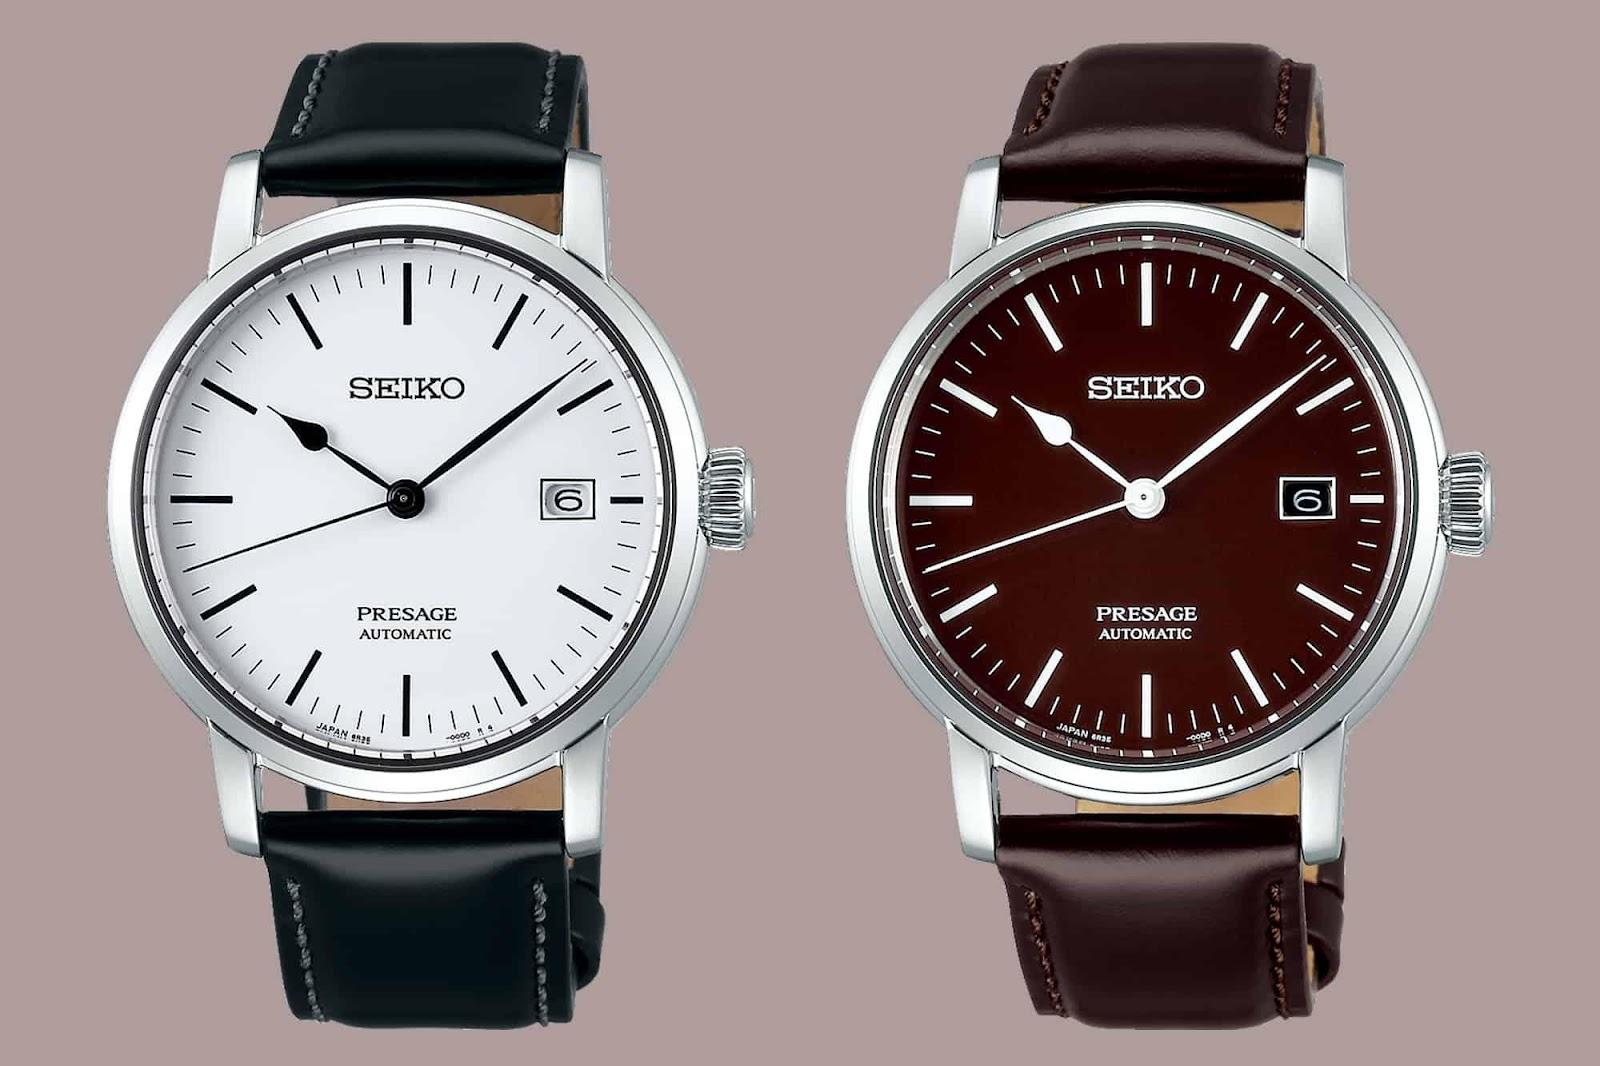 Seiko Adds Two New Riki Watanabe Inspired Watches to their Presage ...